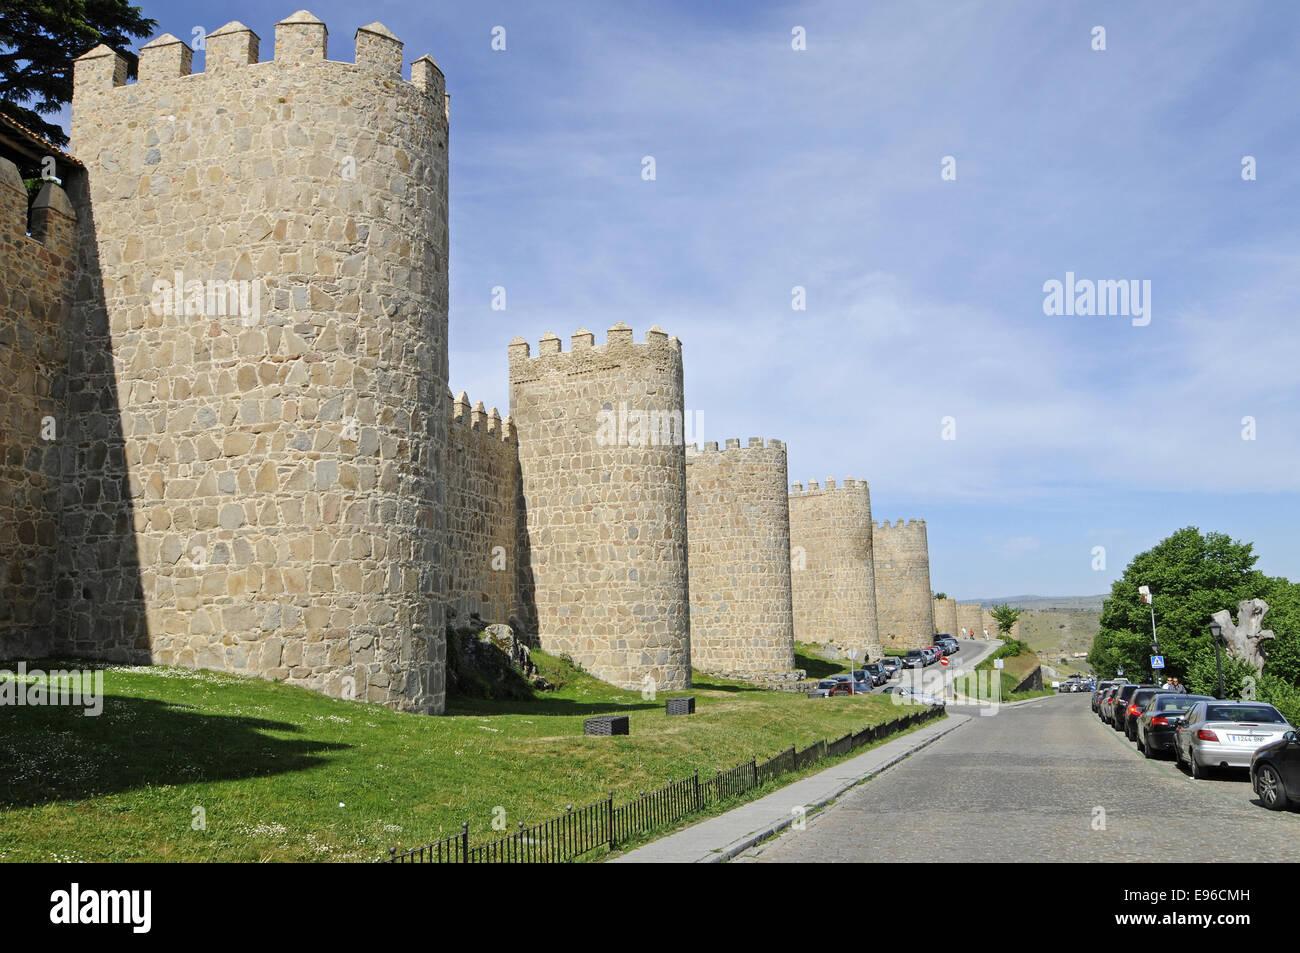 city walls, Avila, Castile-Leon, Spain - Stock Image